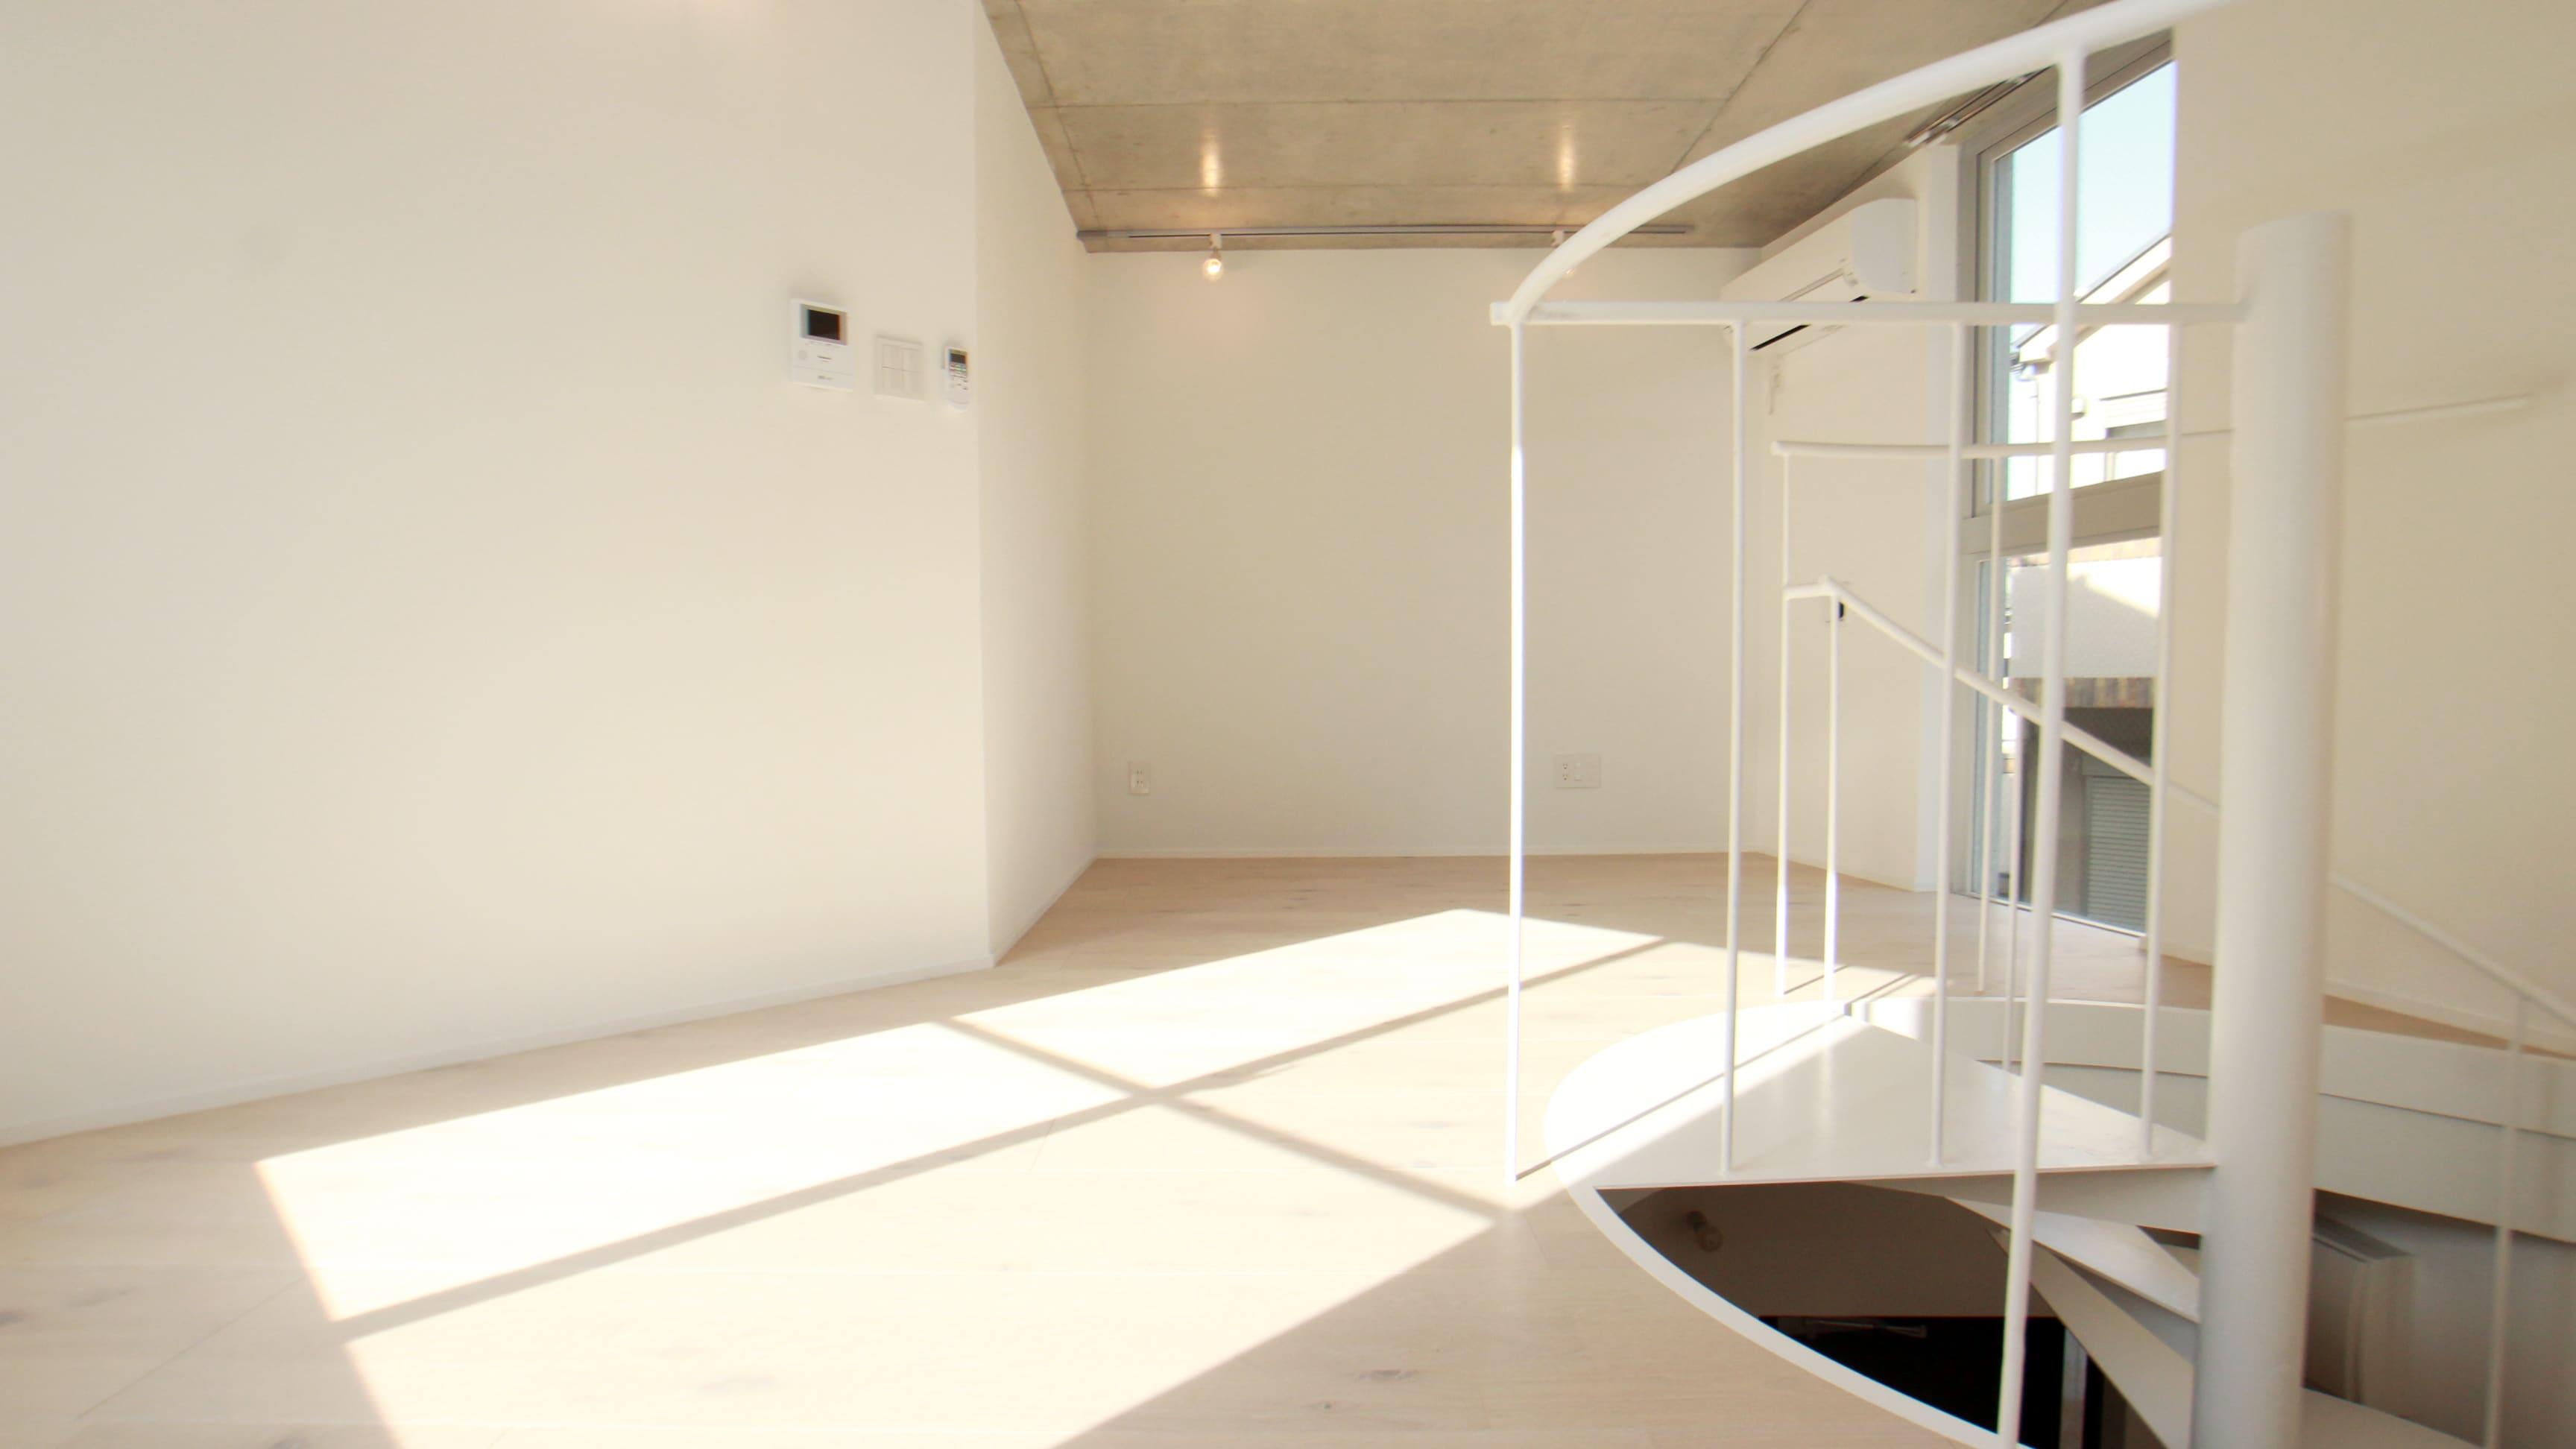 ★feel CnB★猫と暮らす新築デザイナーズマンション01*お申込有*